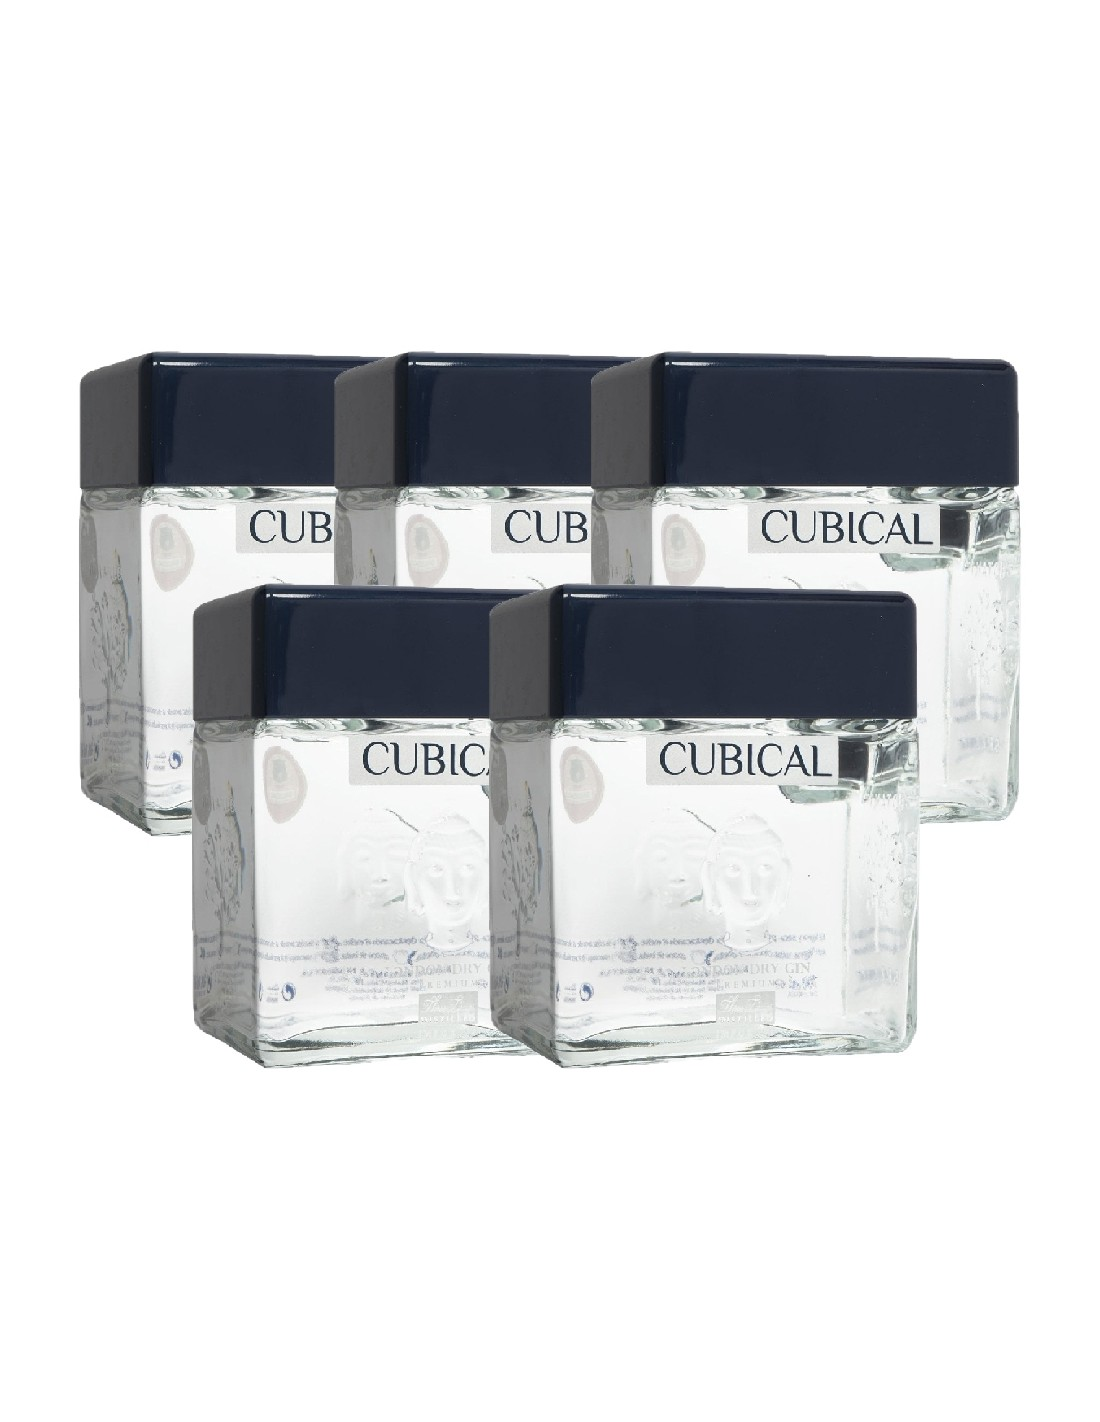 Pachet 5 sticle Gin Botanic Premium Cubical 40% alc., 0.7L, Spania